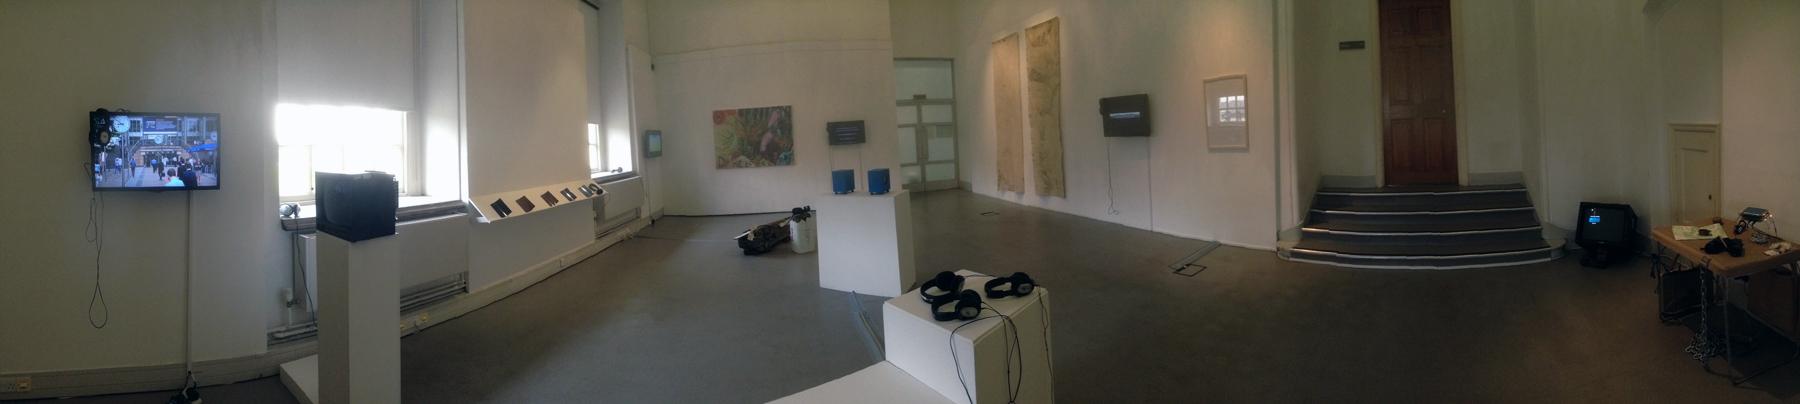 gallery wide